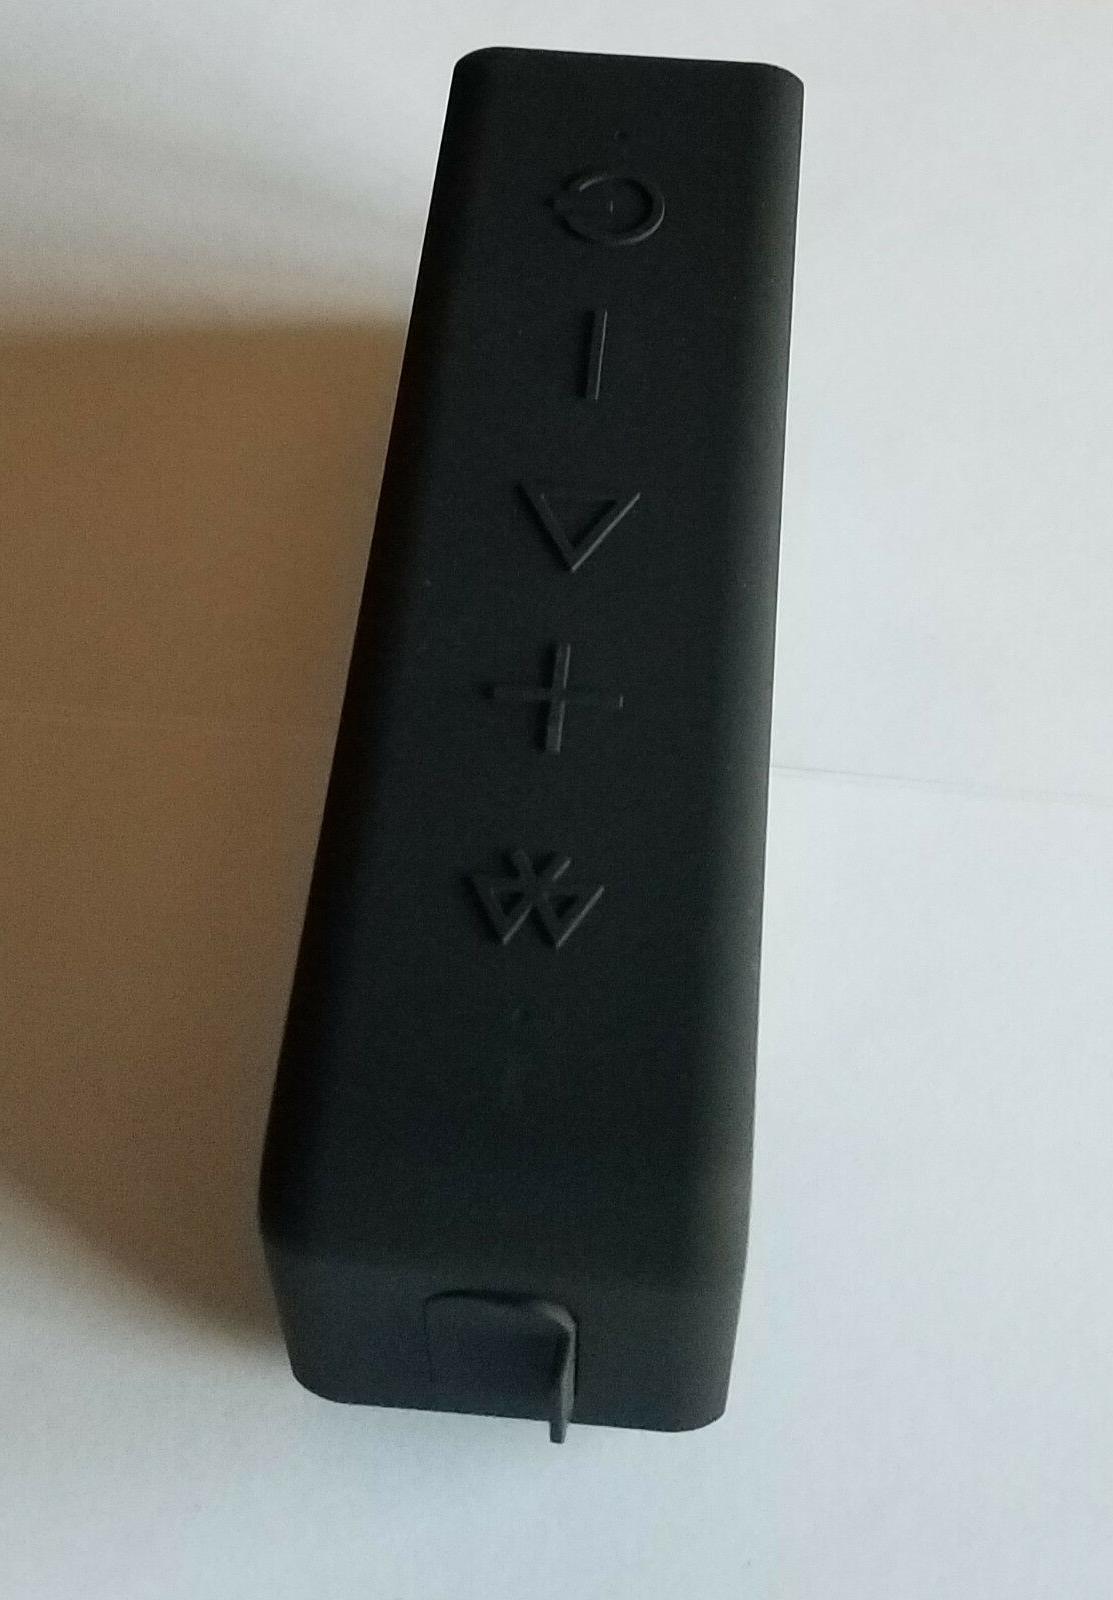 Unused SoundCore Portable - BLACK